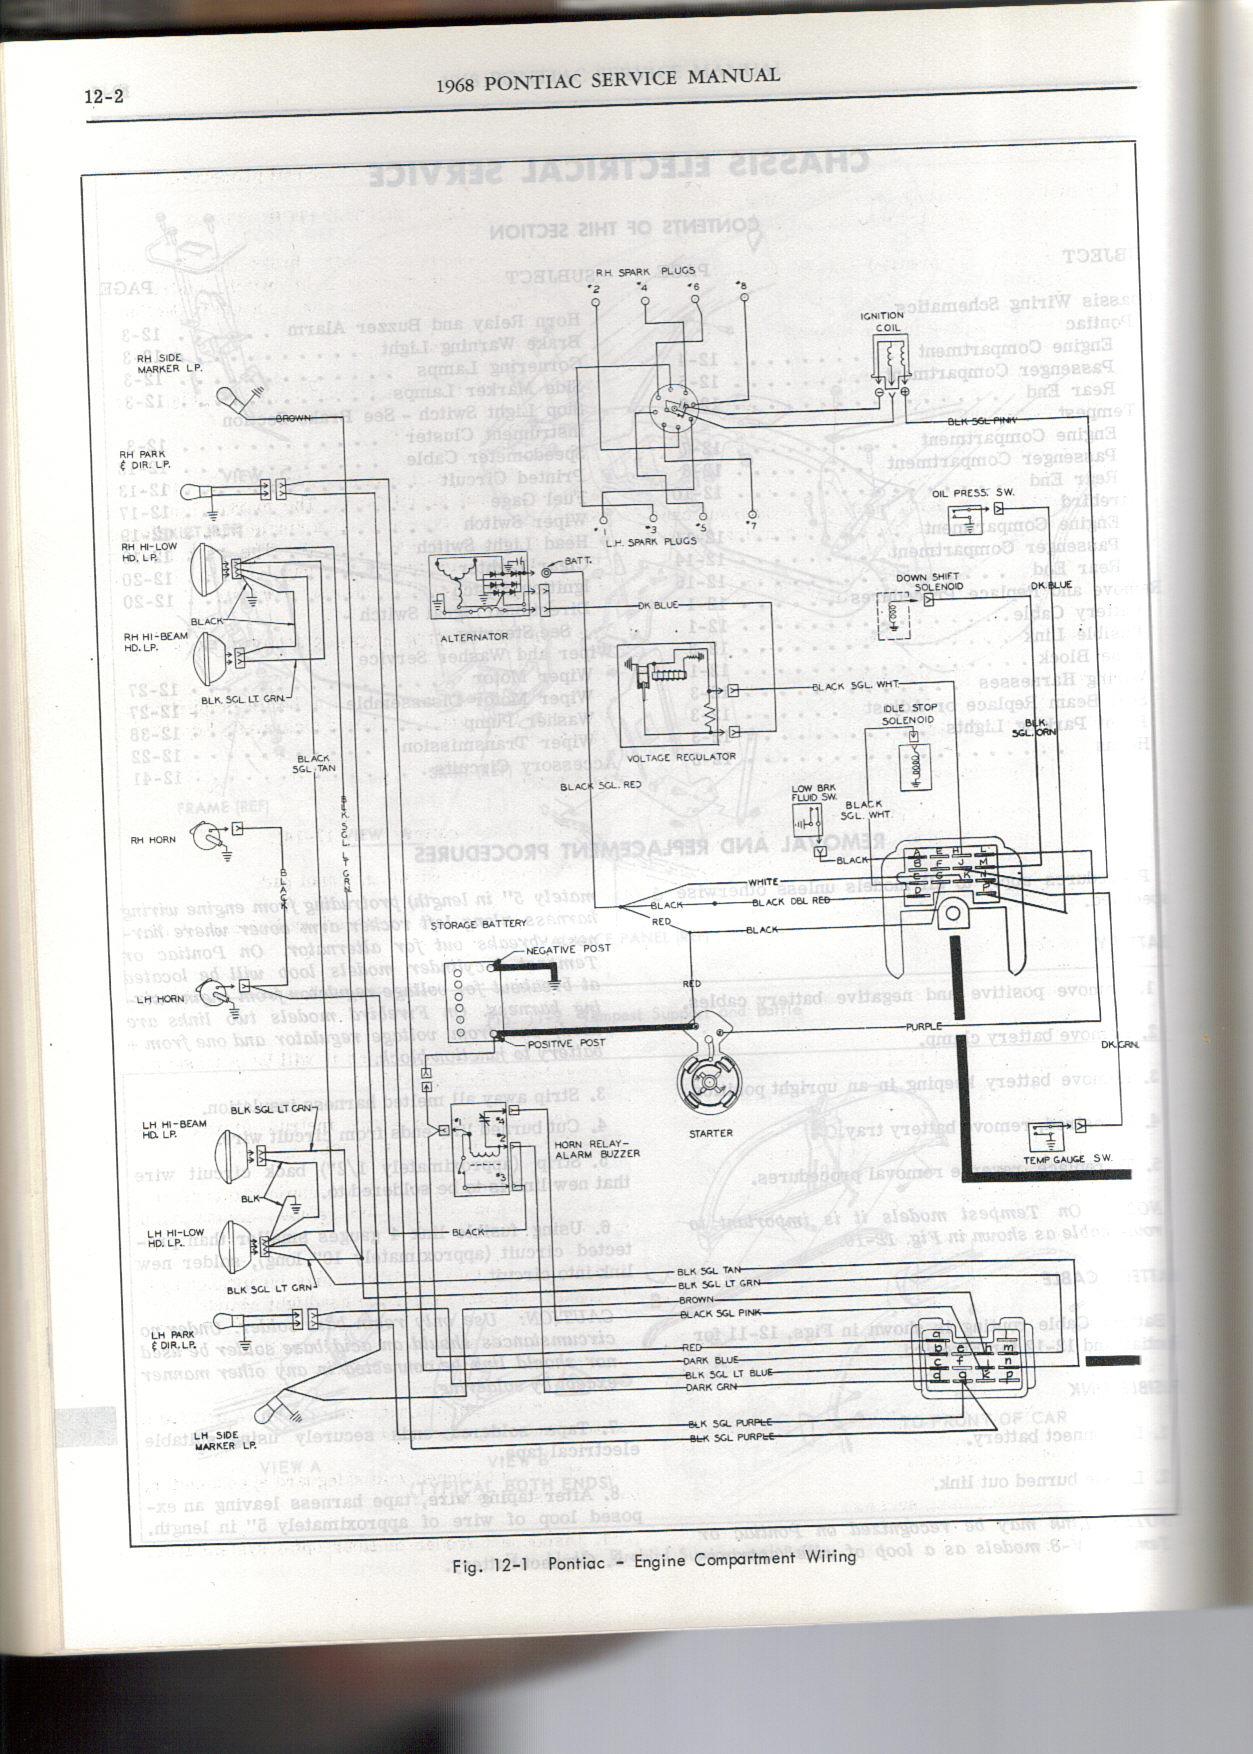 68 GTO Wiring Diagram-wiring-dia.jpg